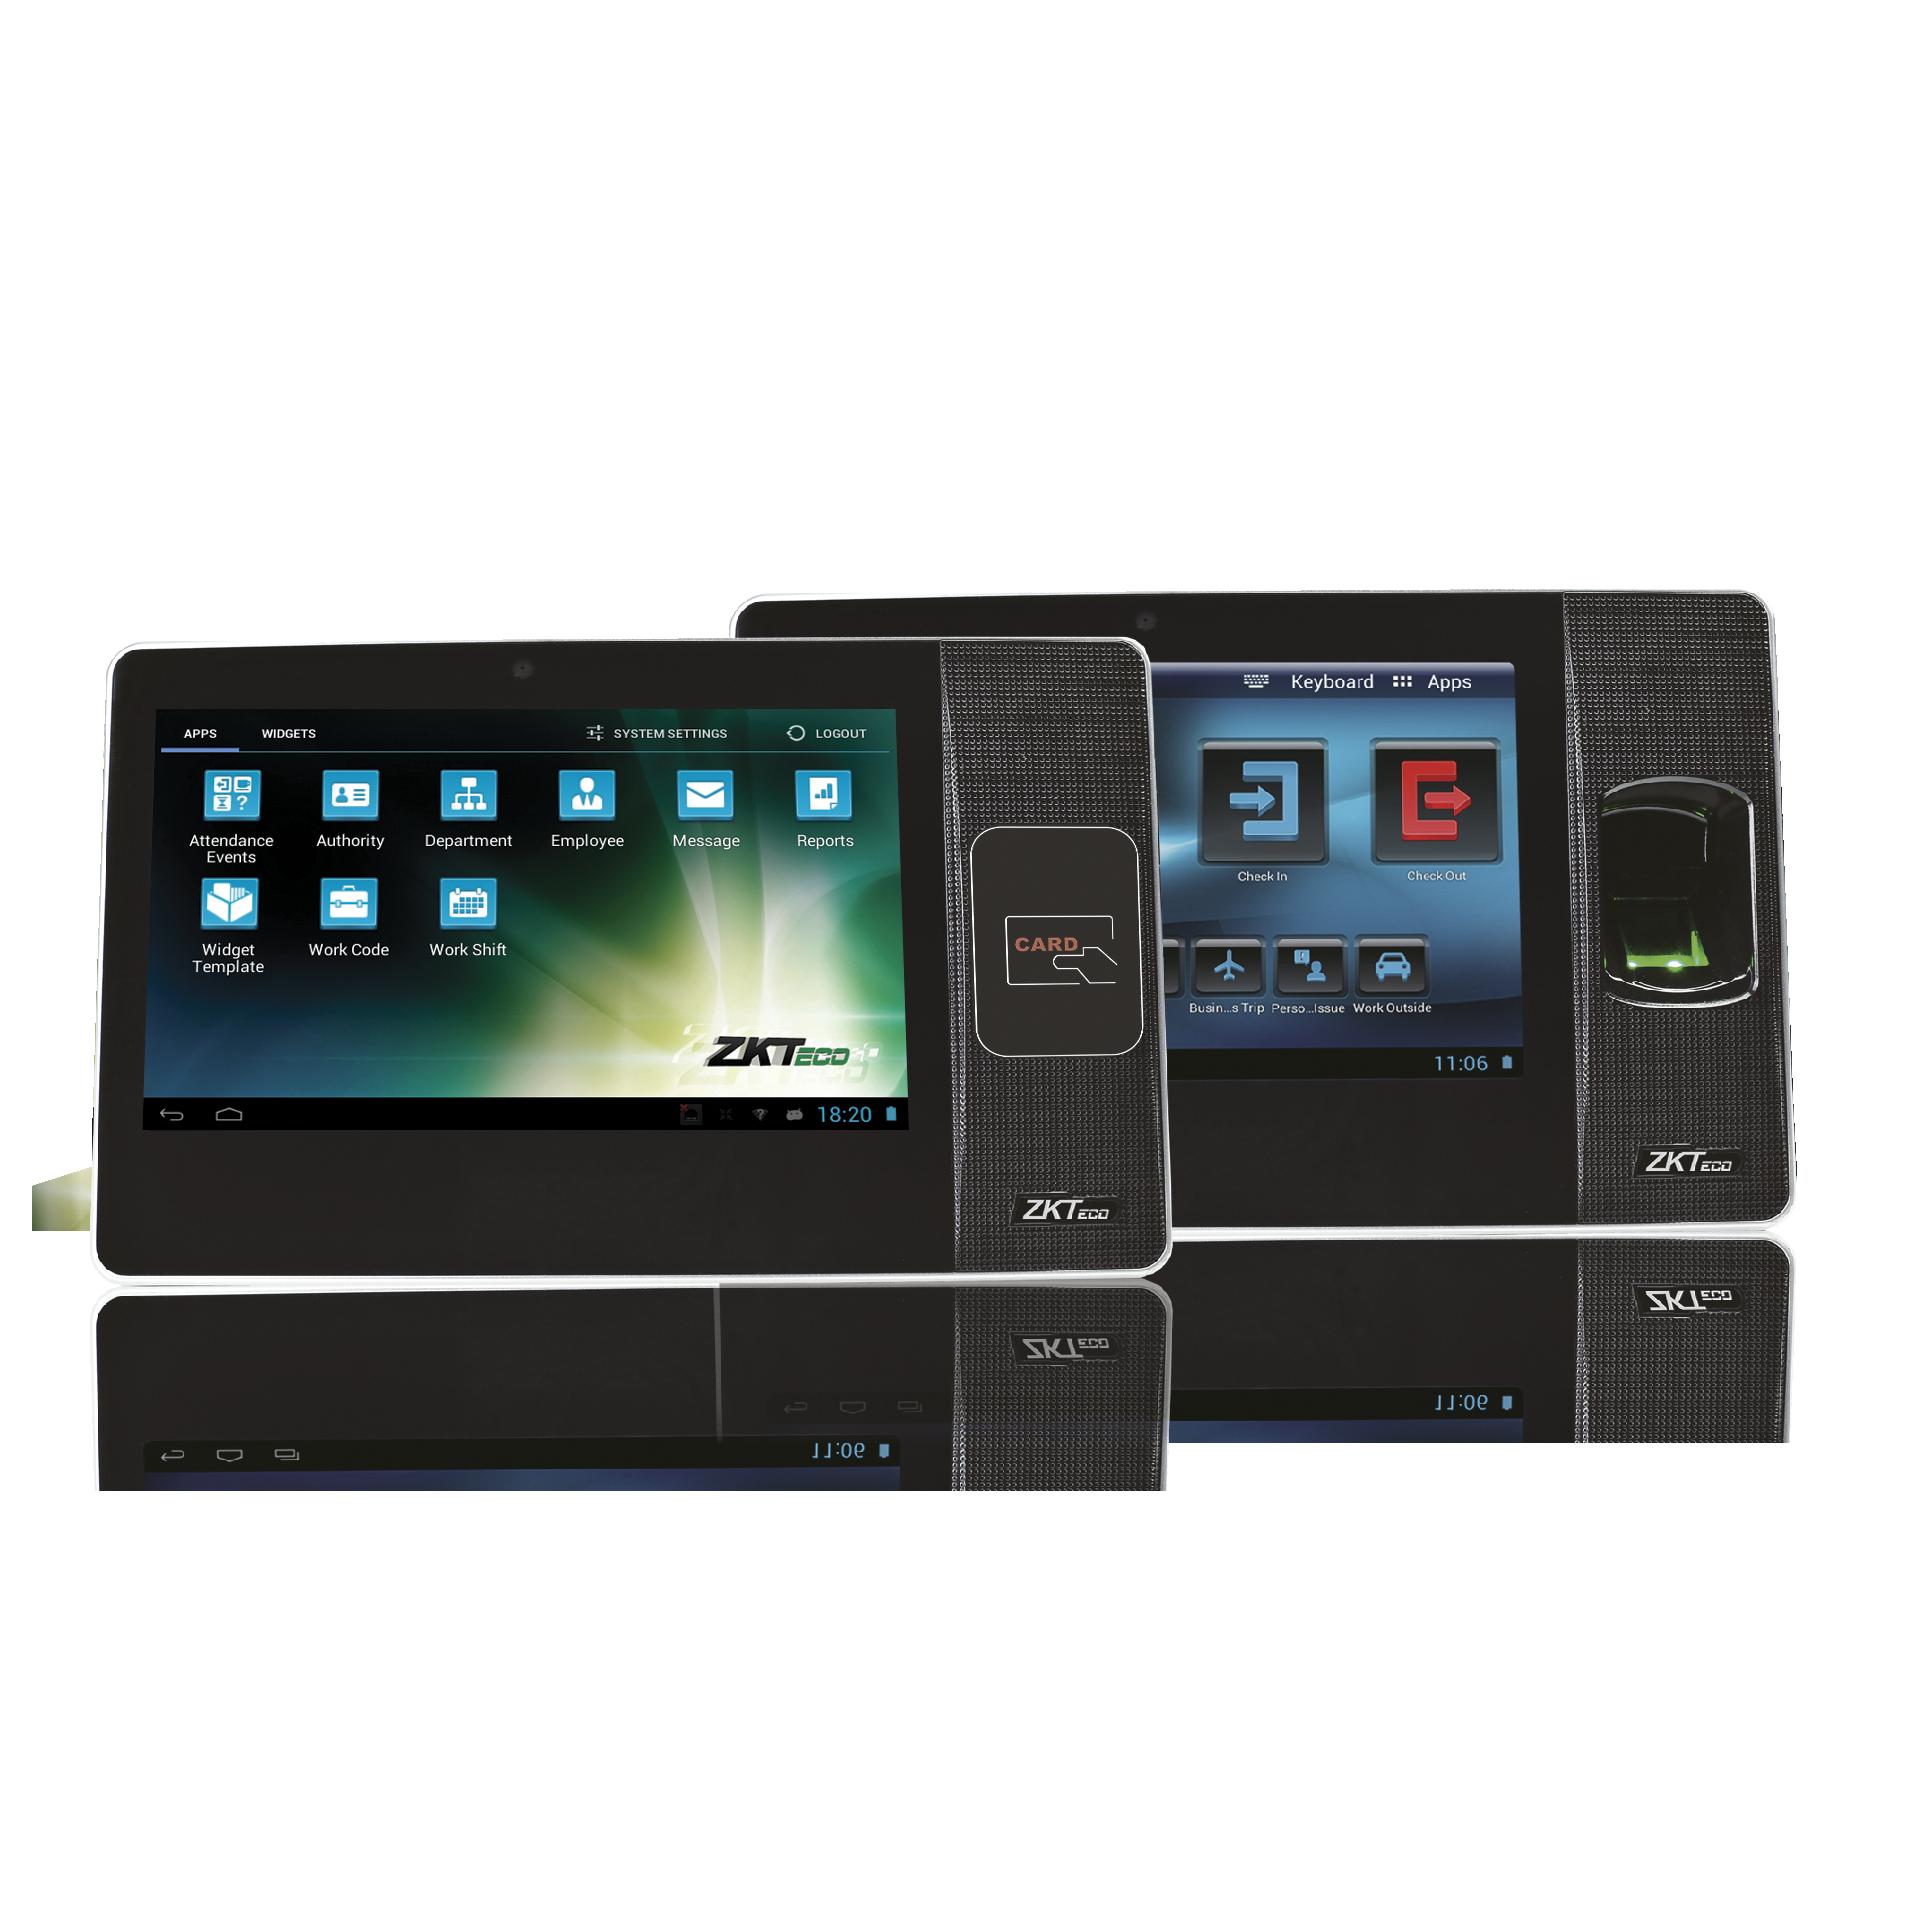 Biopad_RFID_FP_Android_ZKTeco_Europe